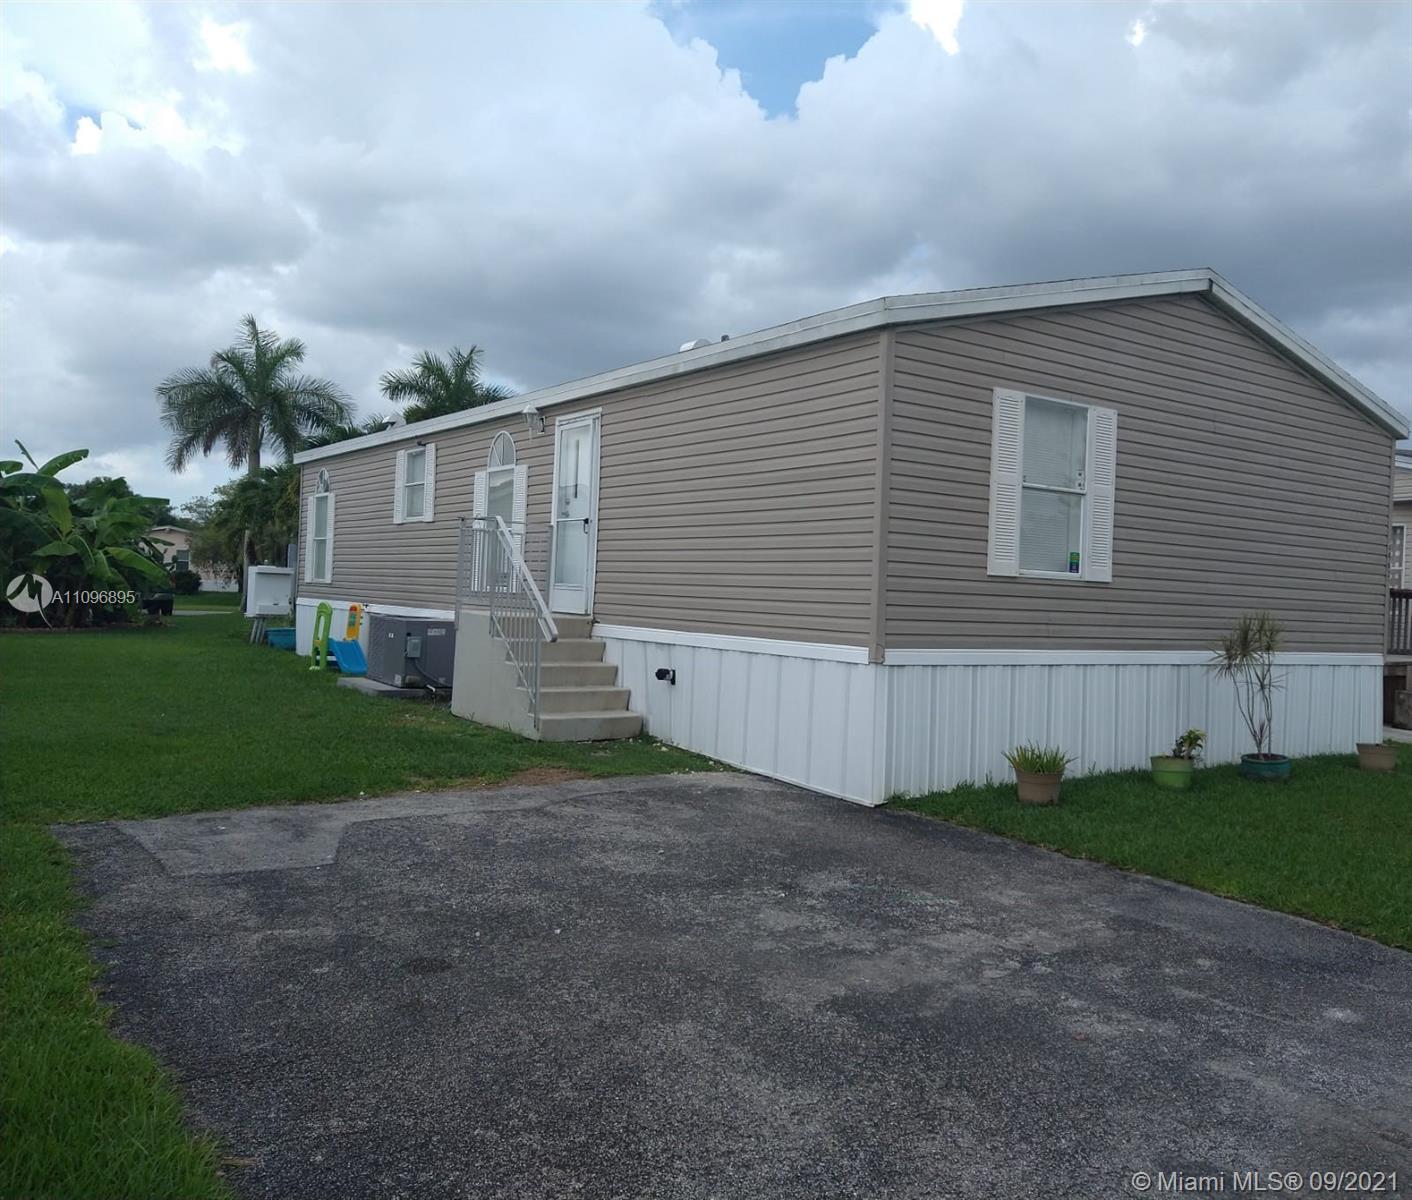 34633 SW 188th Way, Homestead, Florida 33034, 3 Bedrooms Bedrooms, ,2 BathroomsBathrooms,Residential,For Sale,188th Way,A11096895